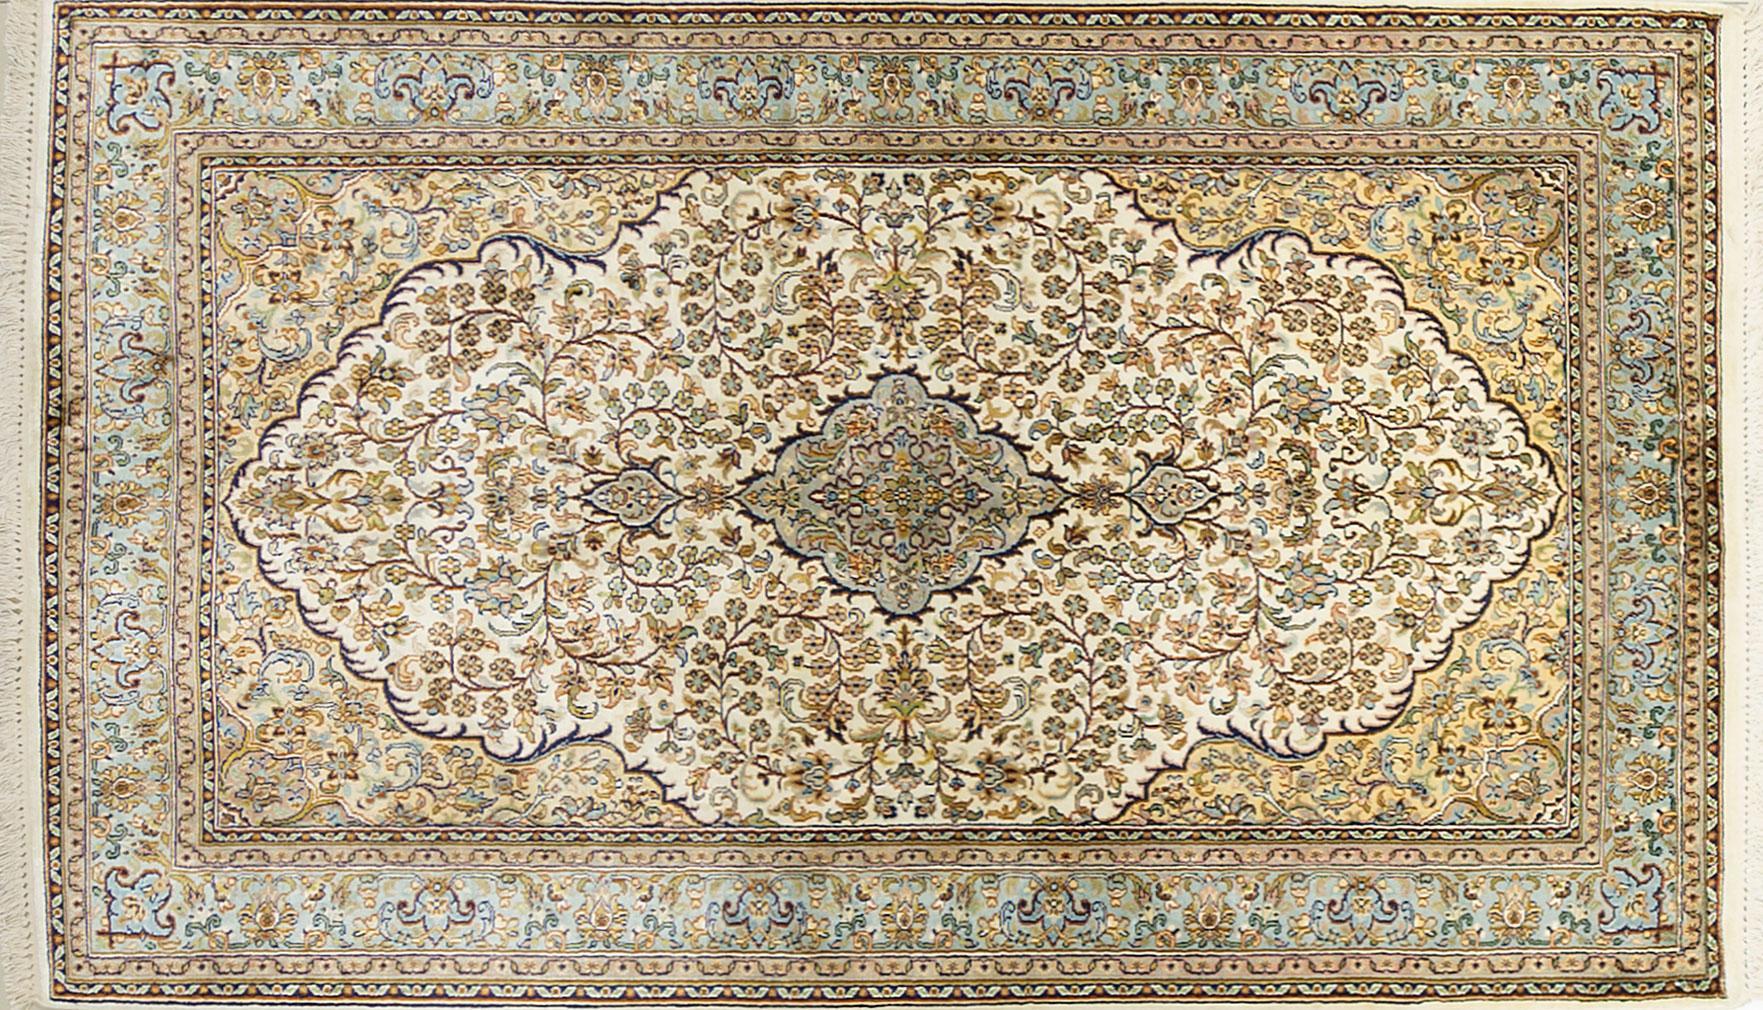 A Hand Knotted Silk Keshmiri Rug, 156 x 91